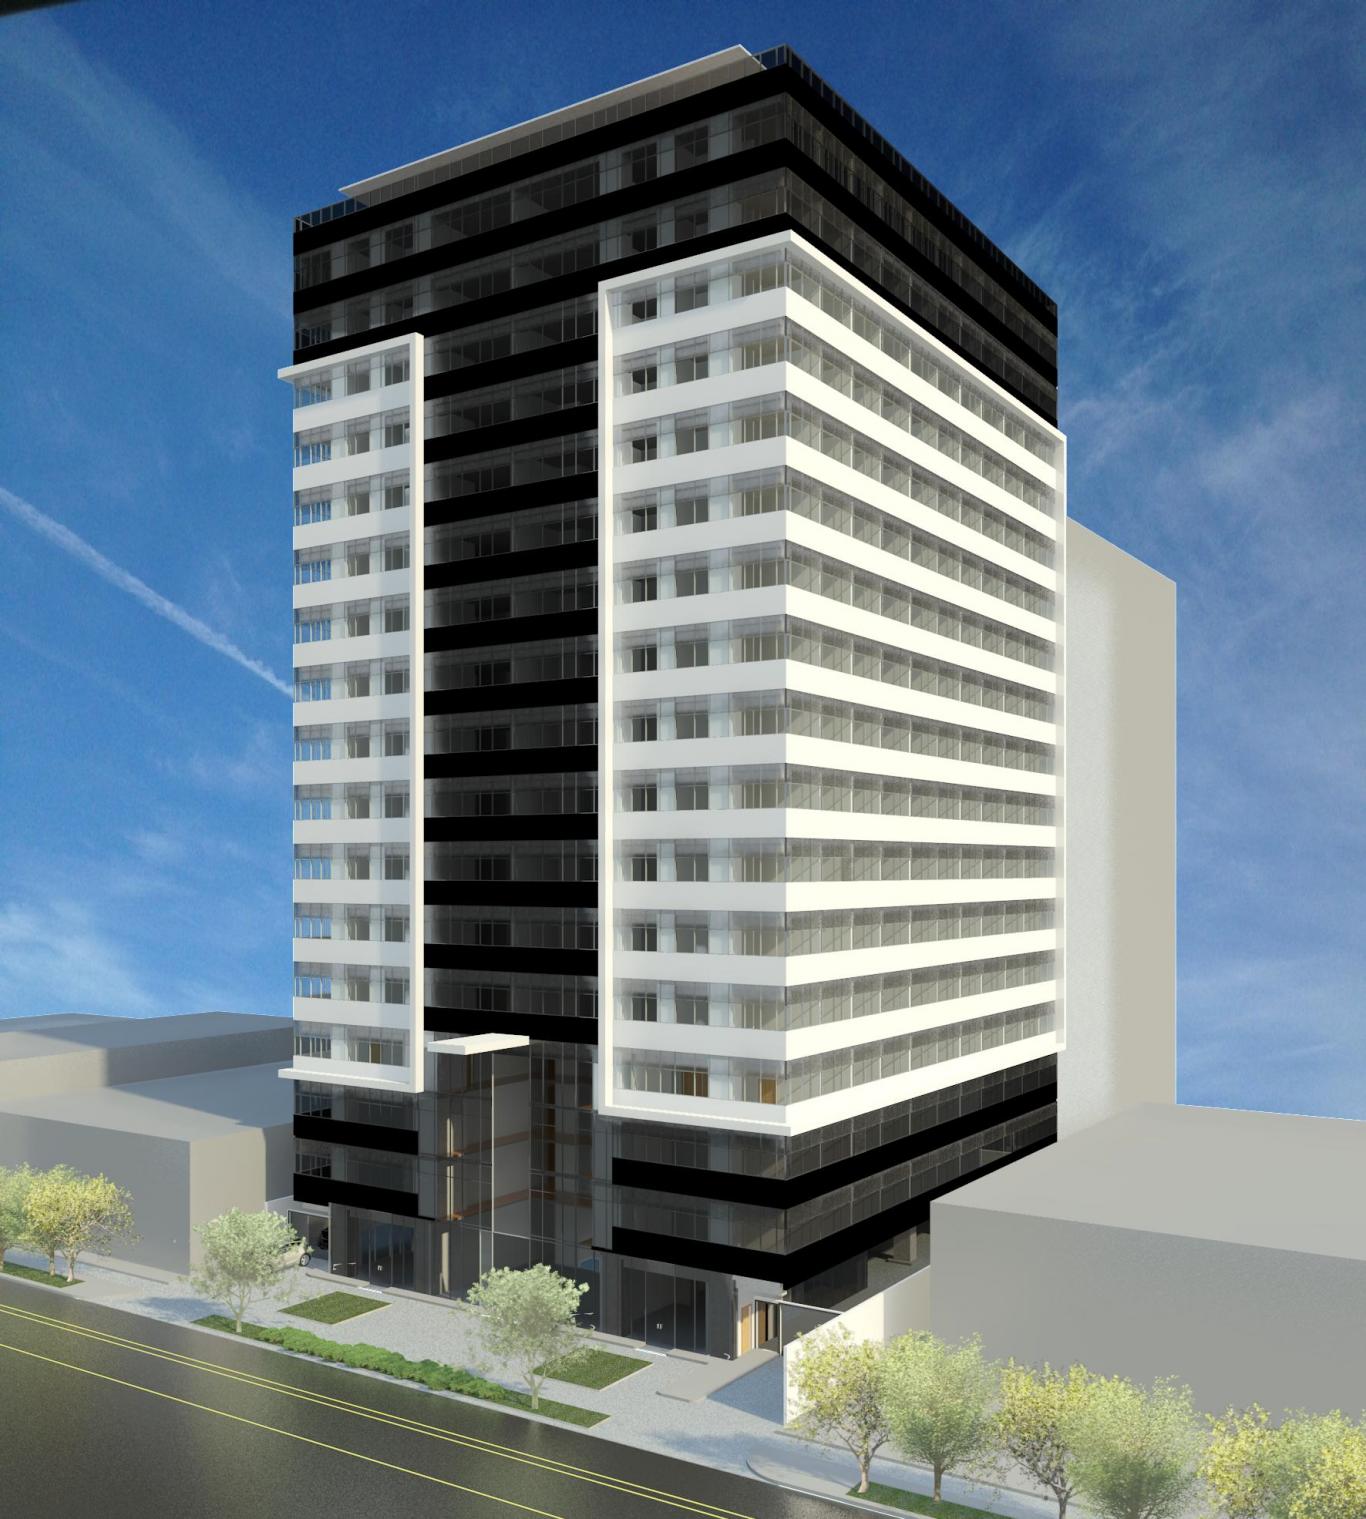 Id 1659155, capitolio residencial nuevo coyoacan, no 5,